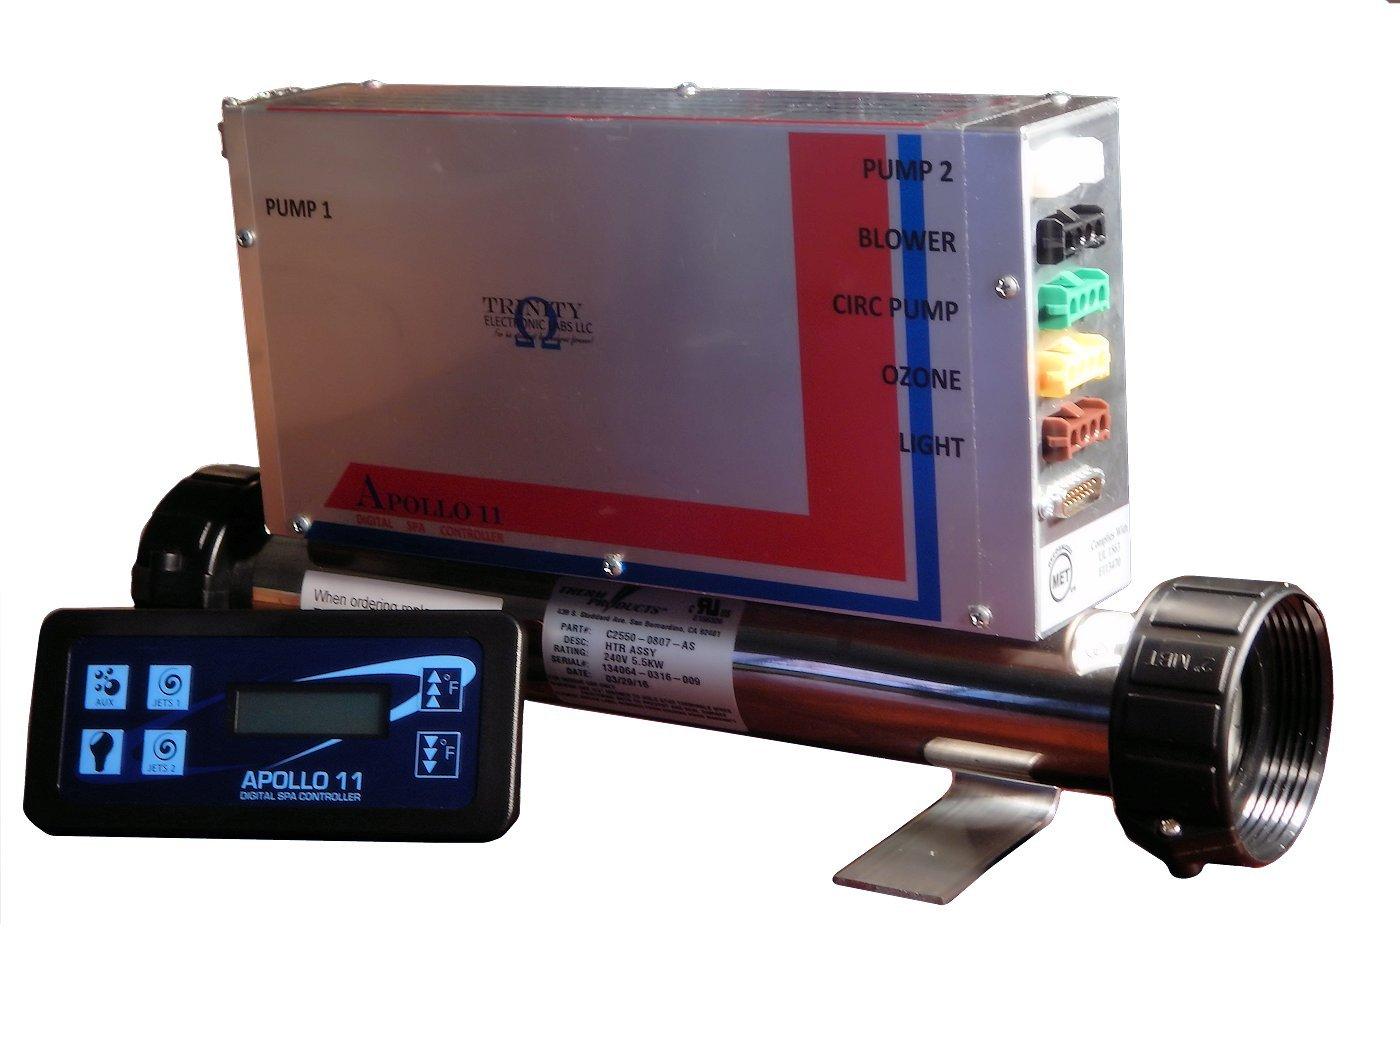 Apollo 11 Digital Spa Controller /Spa Pack / Spa Control Syrtem 2 Pumps, Blower, Circ Pump, Ozone, Fiber Optic Light. 12V Light with Heater by Apollo